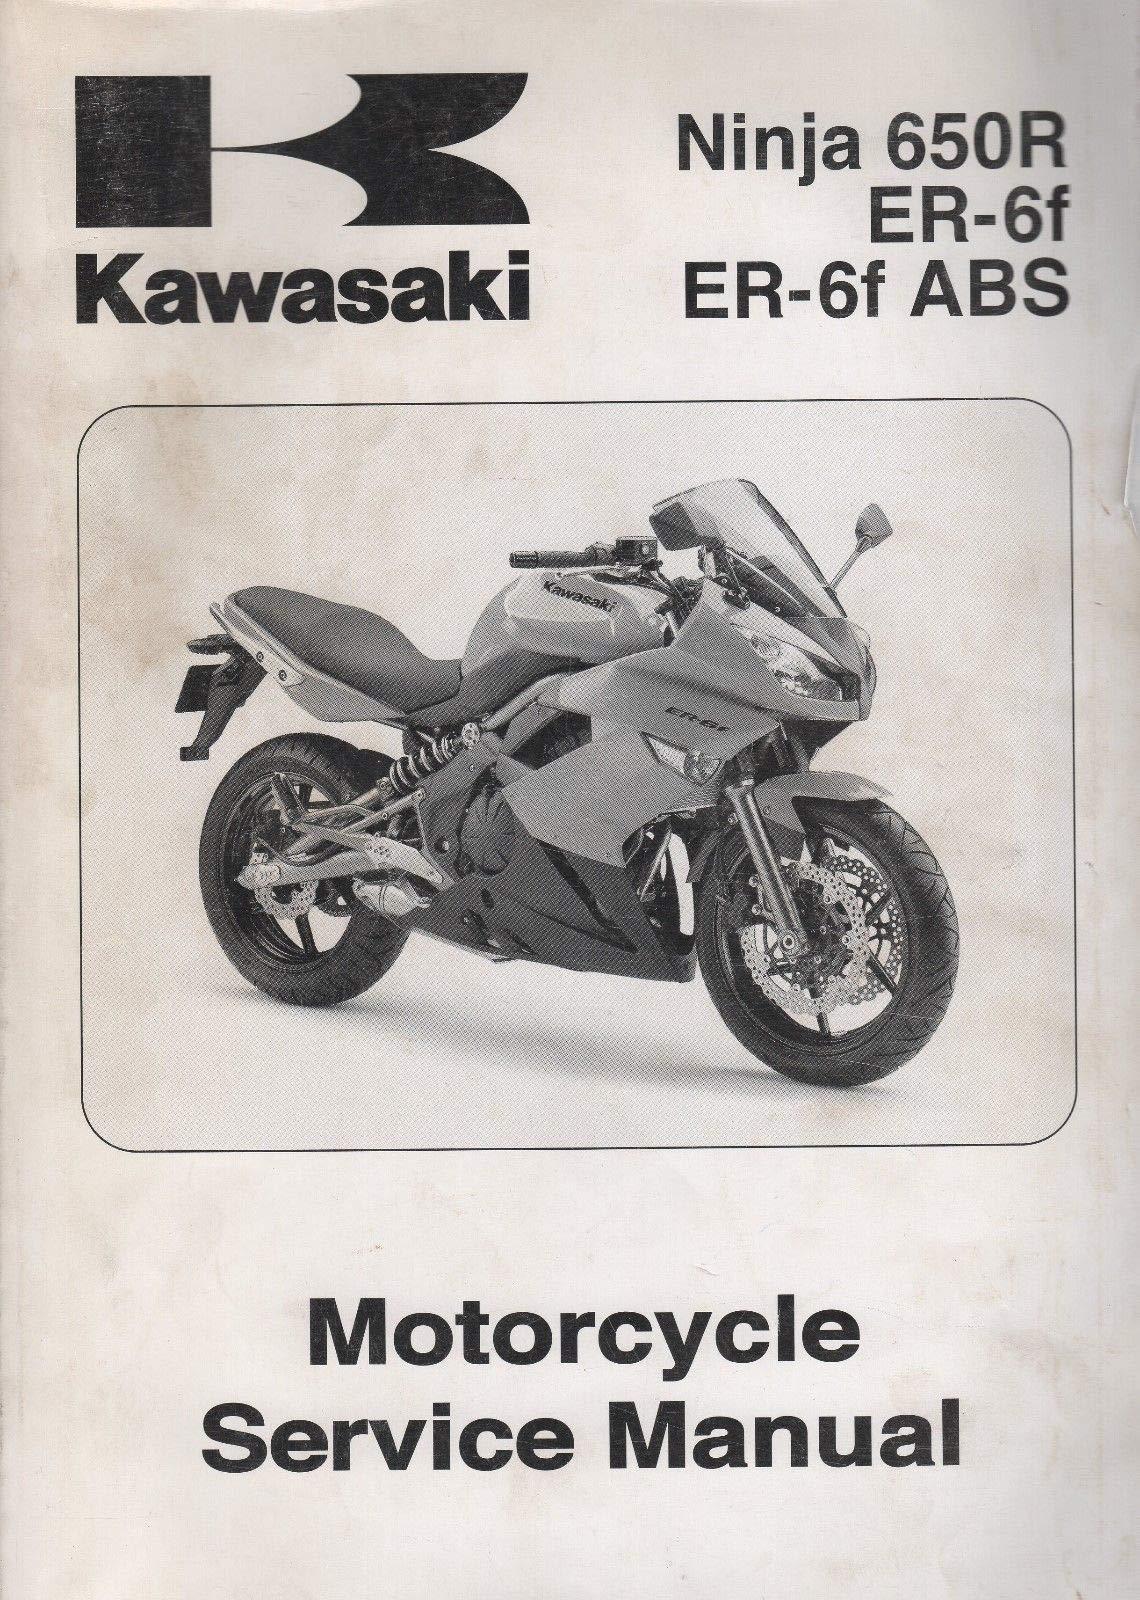 2009 KAWASAKI MOTORCYCLE NINJA 650R, ER-6f SERVICE MANUAL P ...